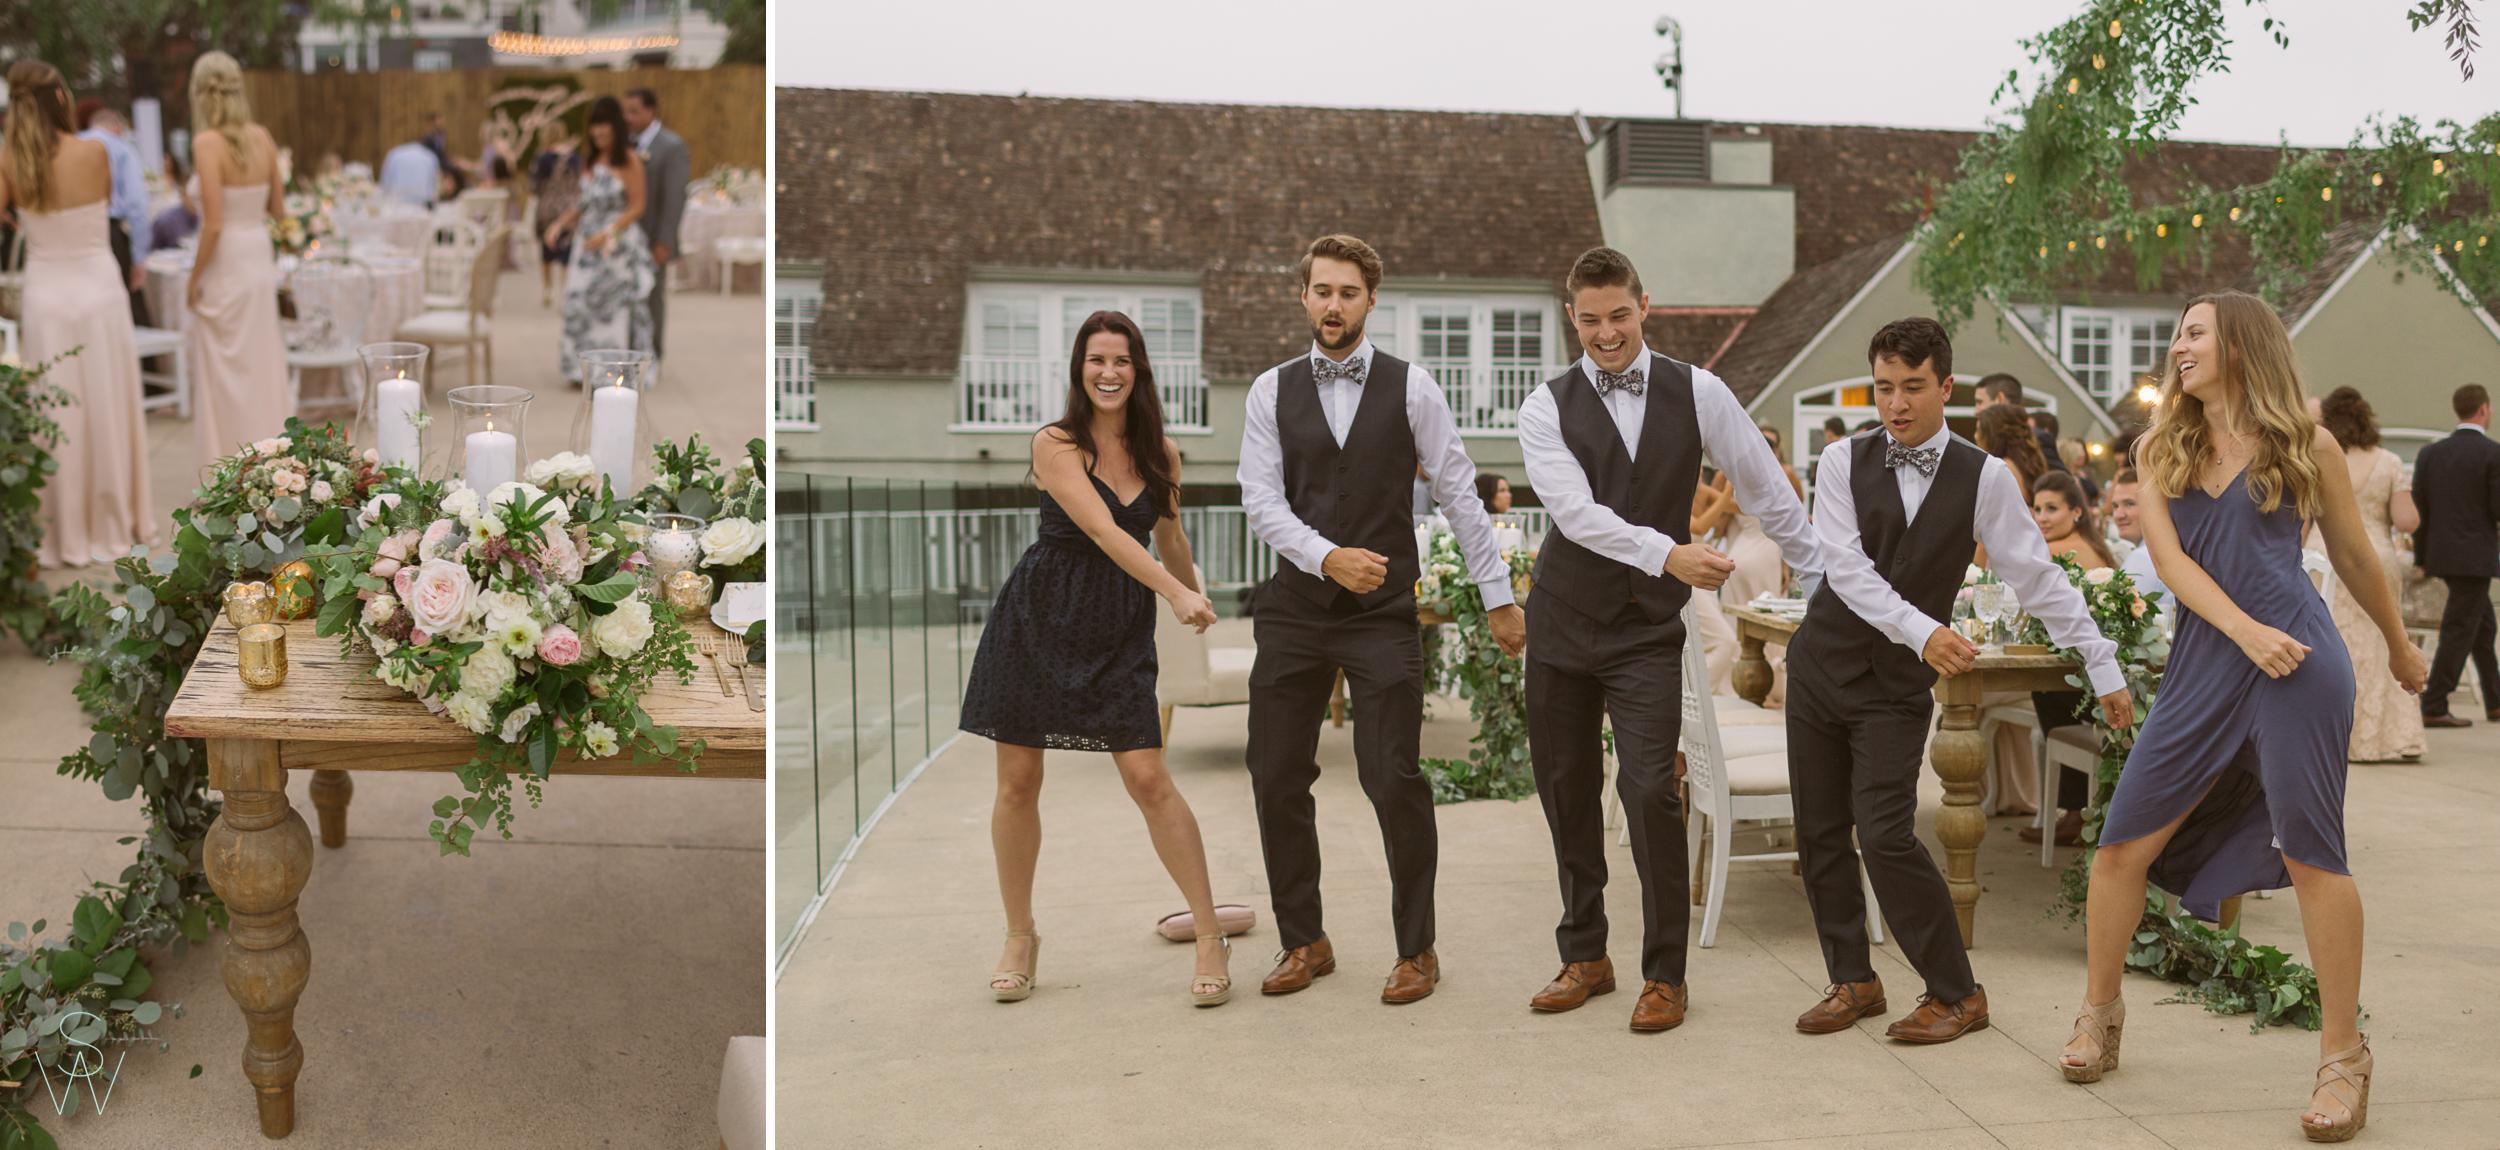 211Lauberge.shewanders.wedding.photography.JPG